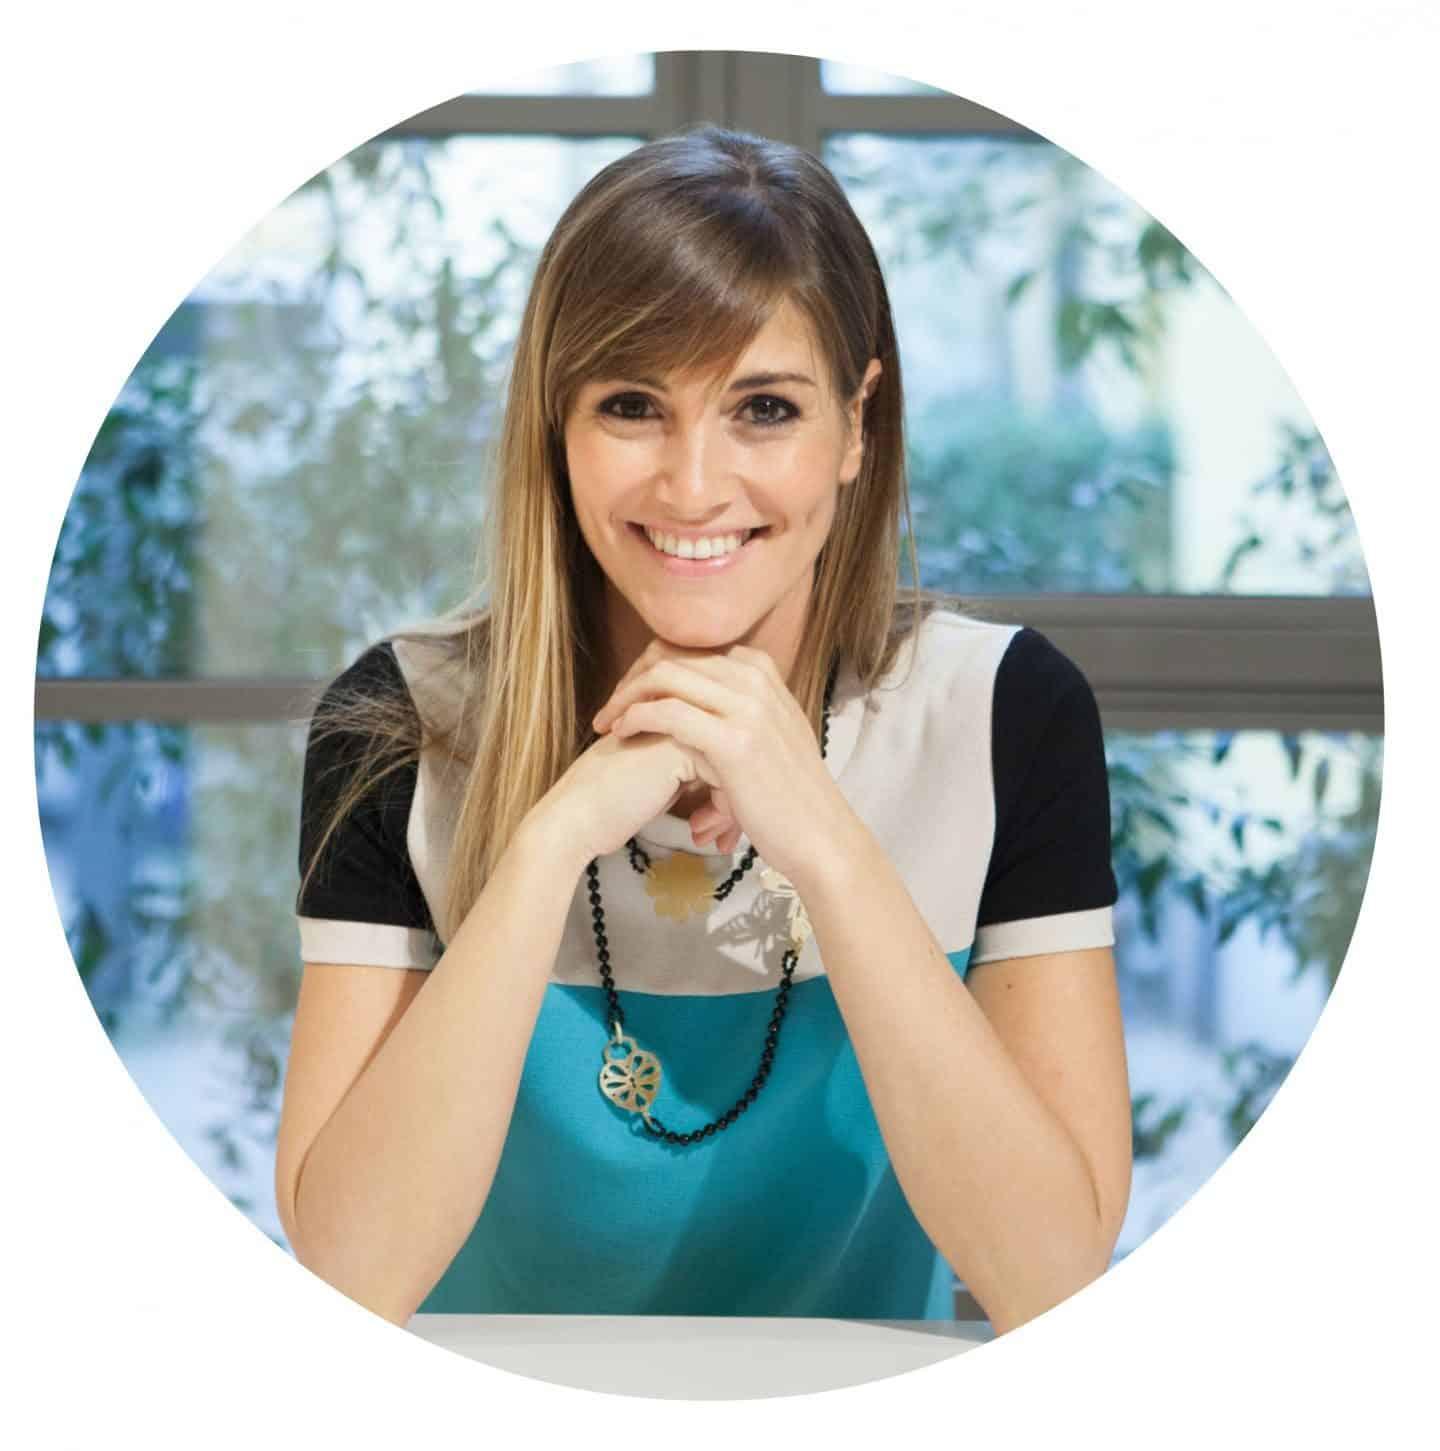 Valentina Bertazzoni, STyle and Communications Director at Bertazzoni